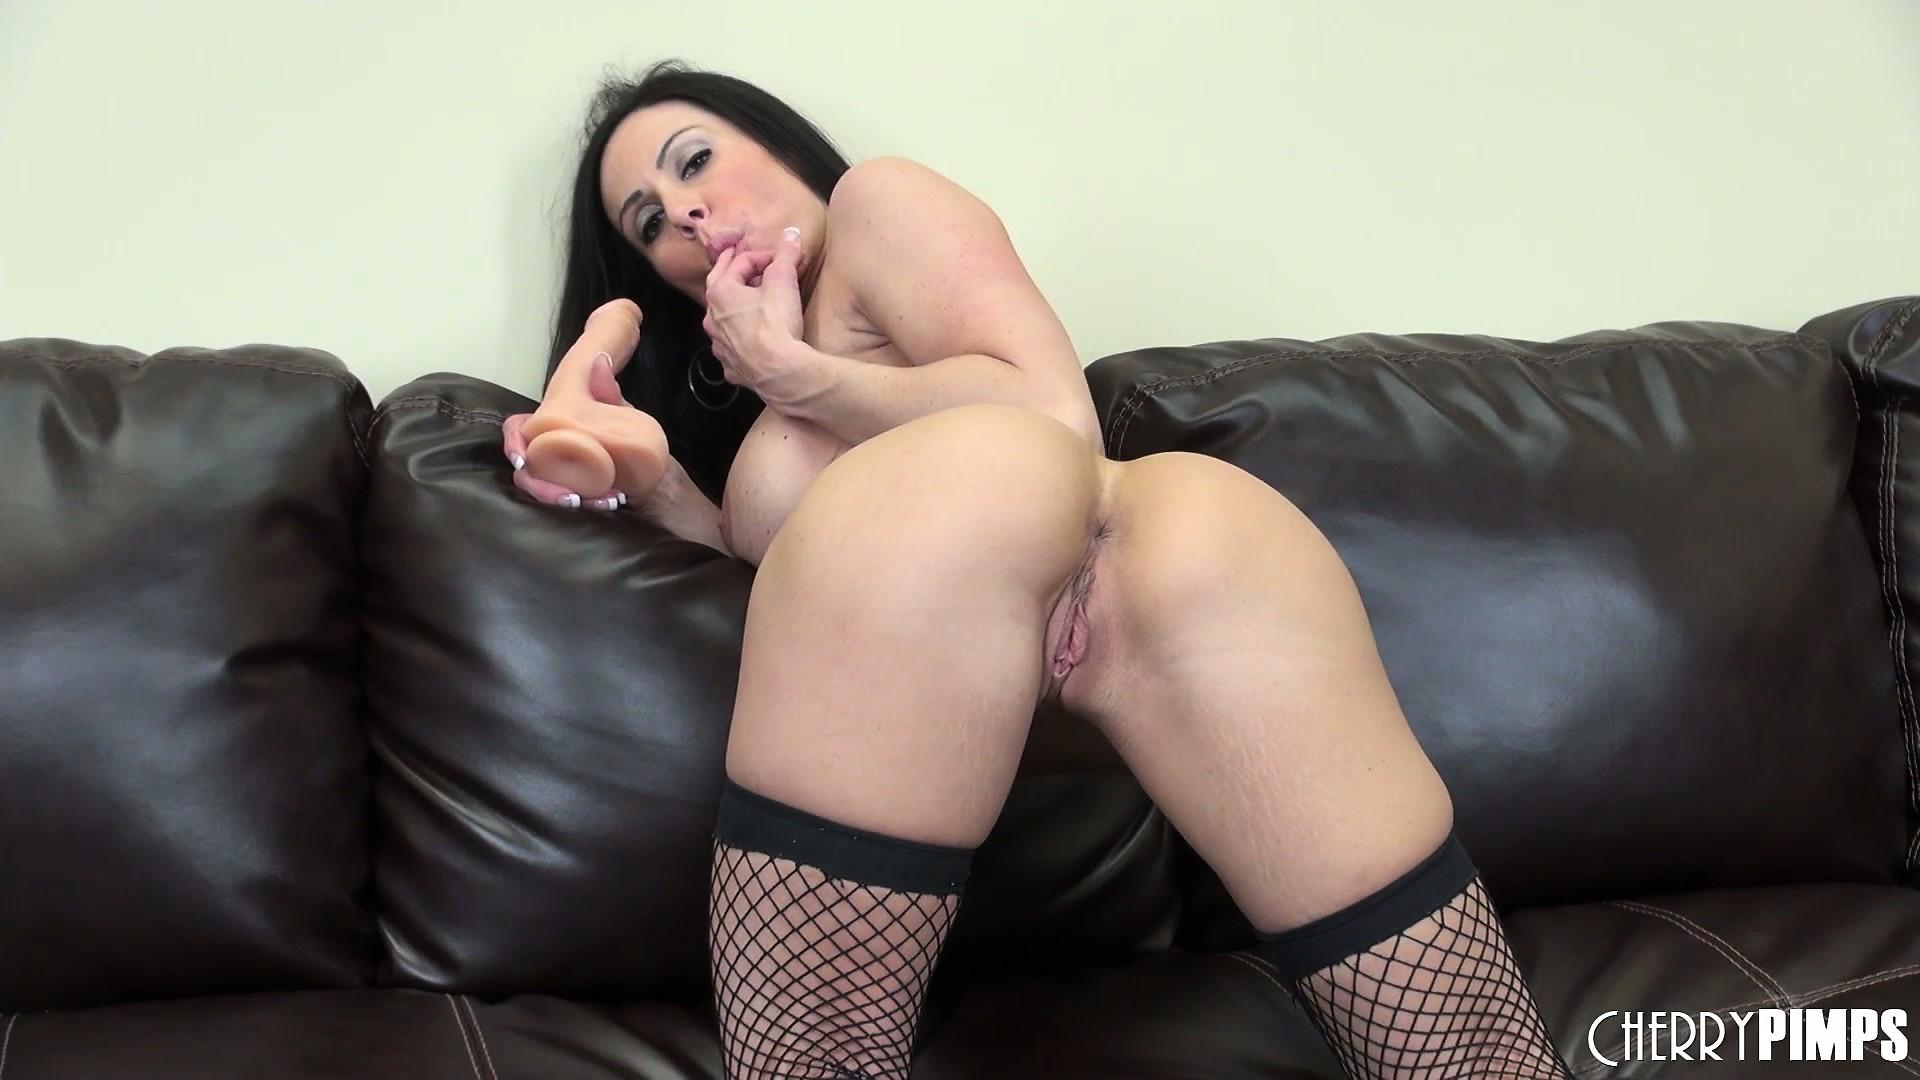 Ashley nicole anal free porn videos